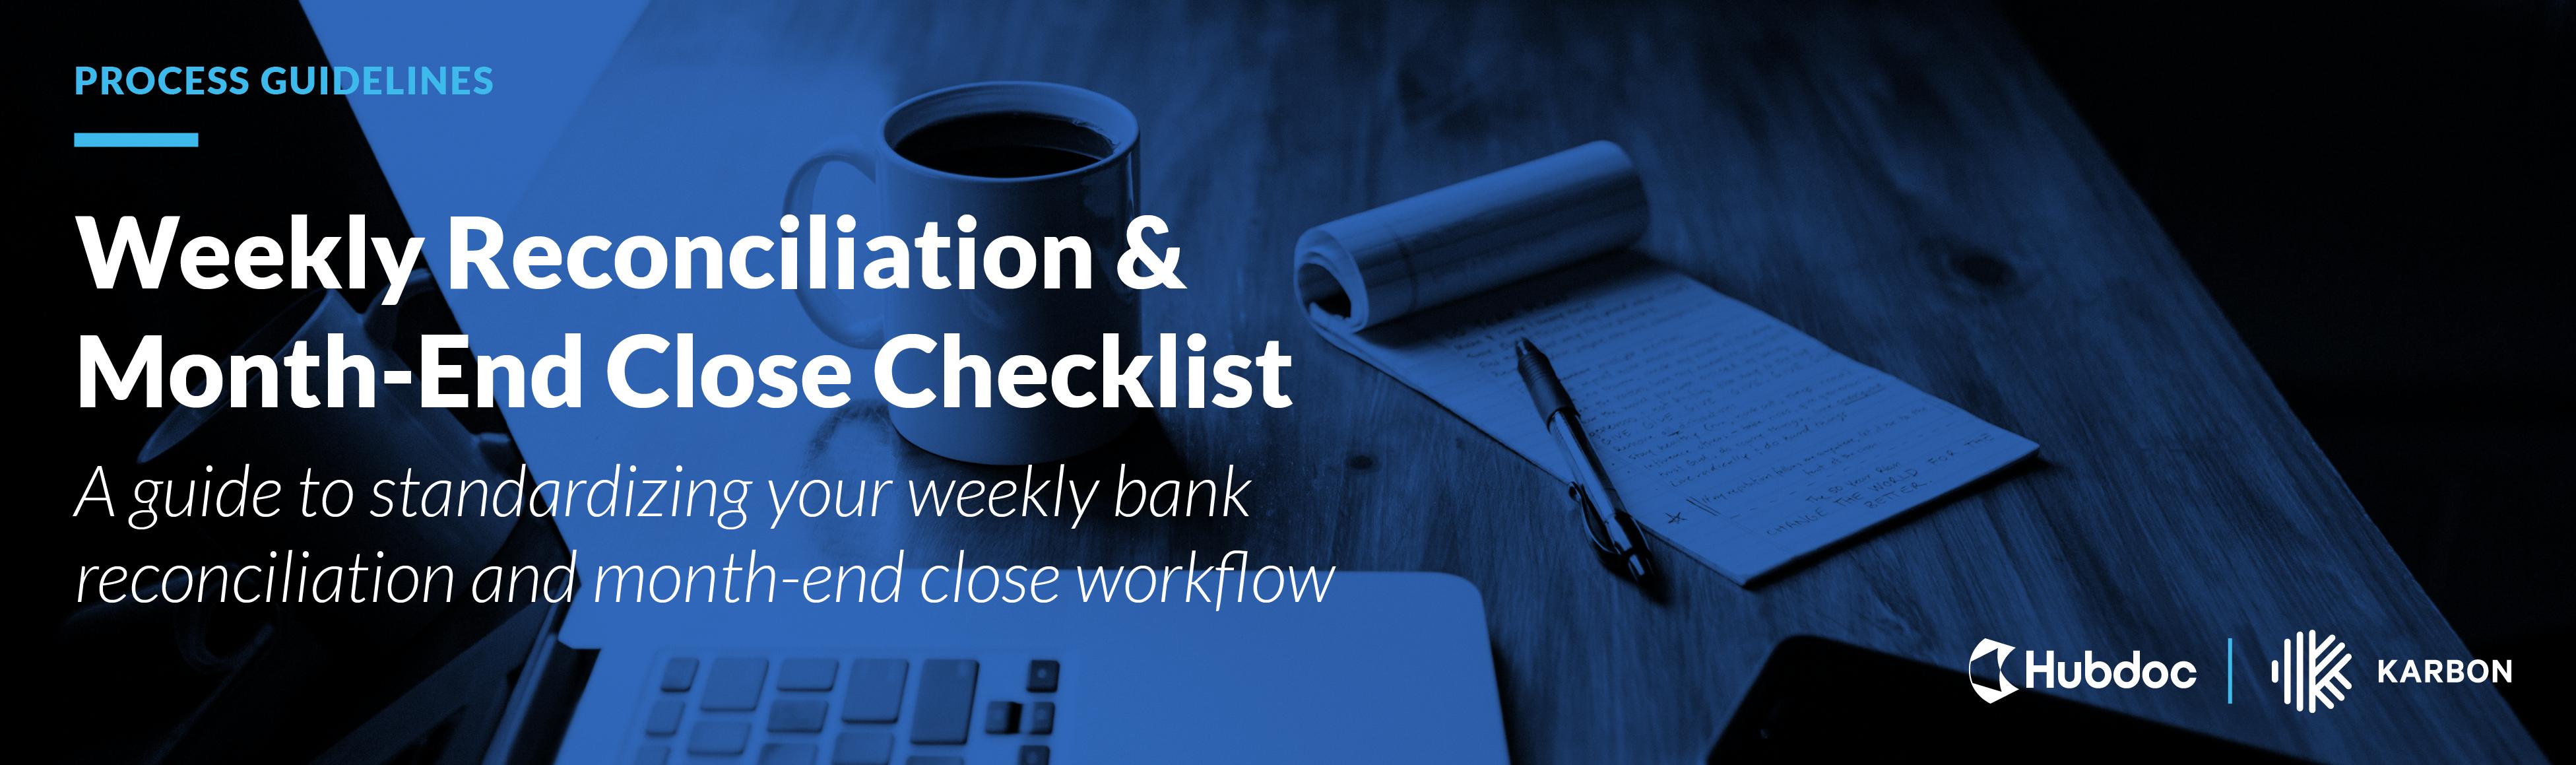 Weekly Reconciliation & Month-End Close Checklist